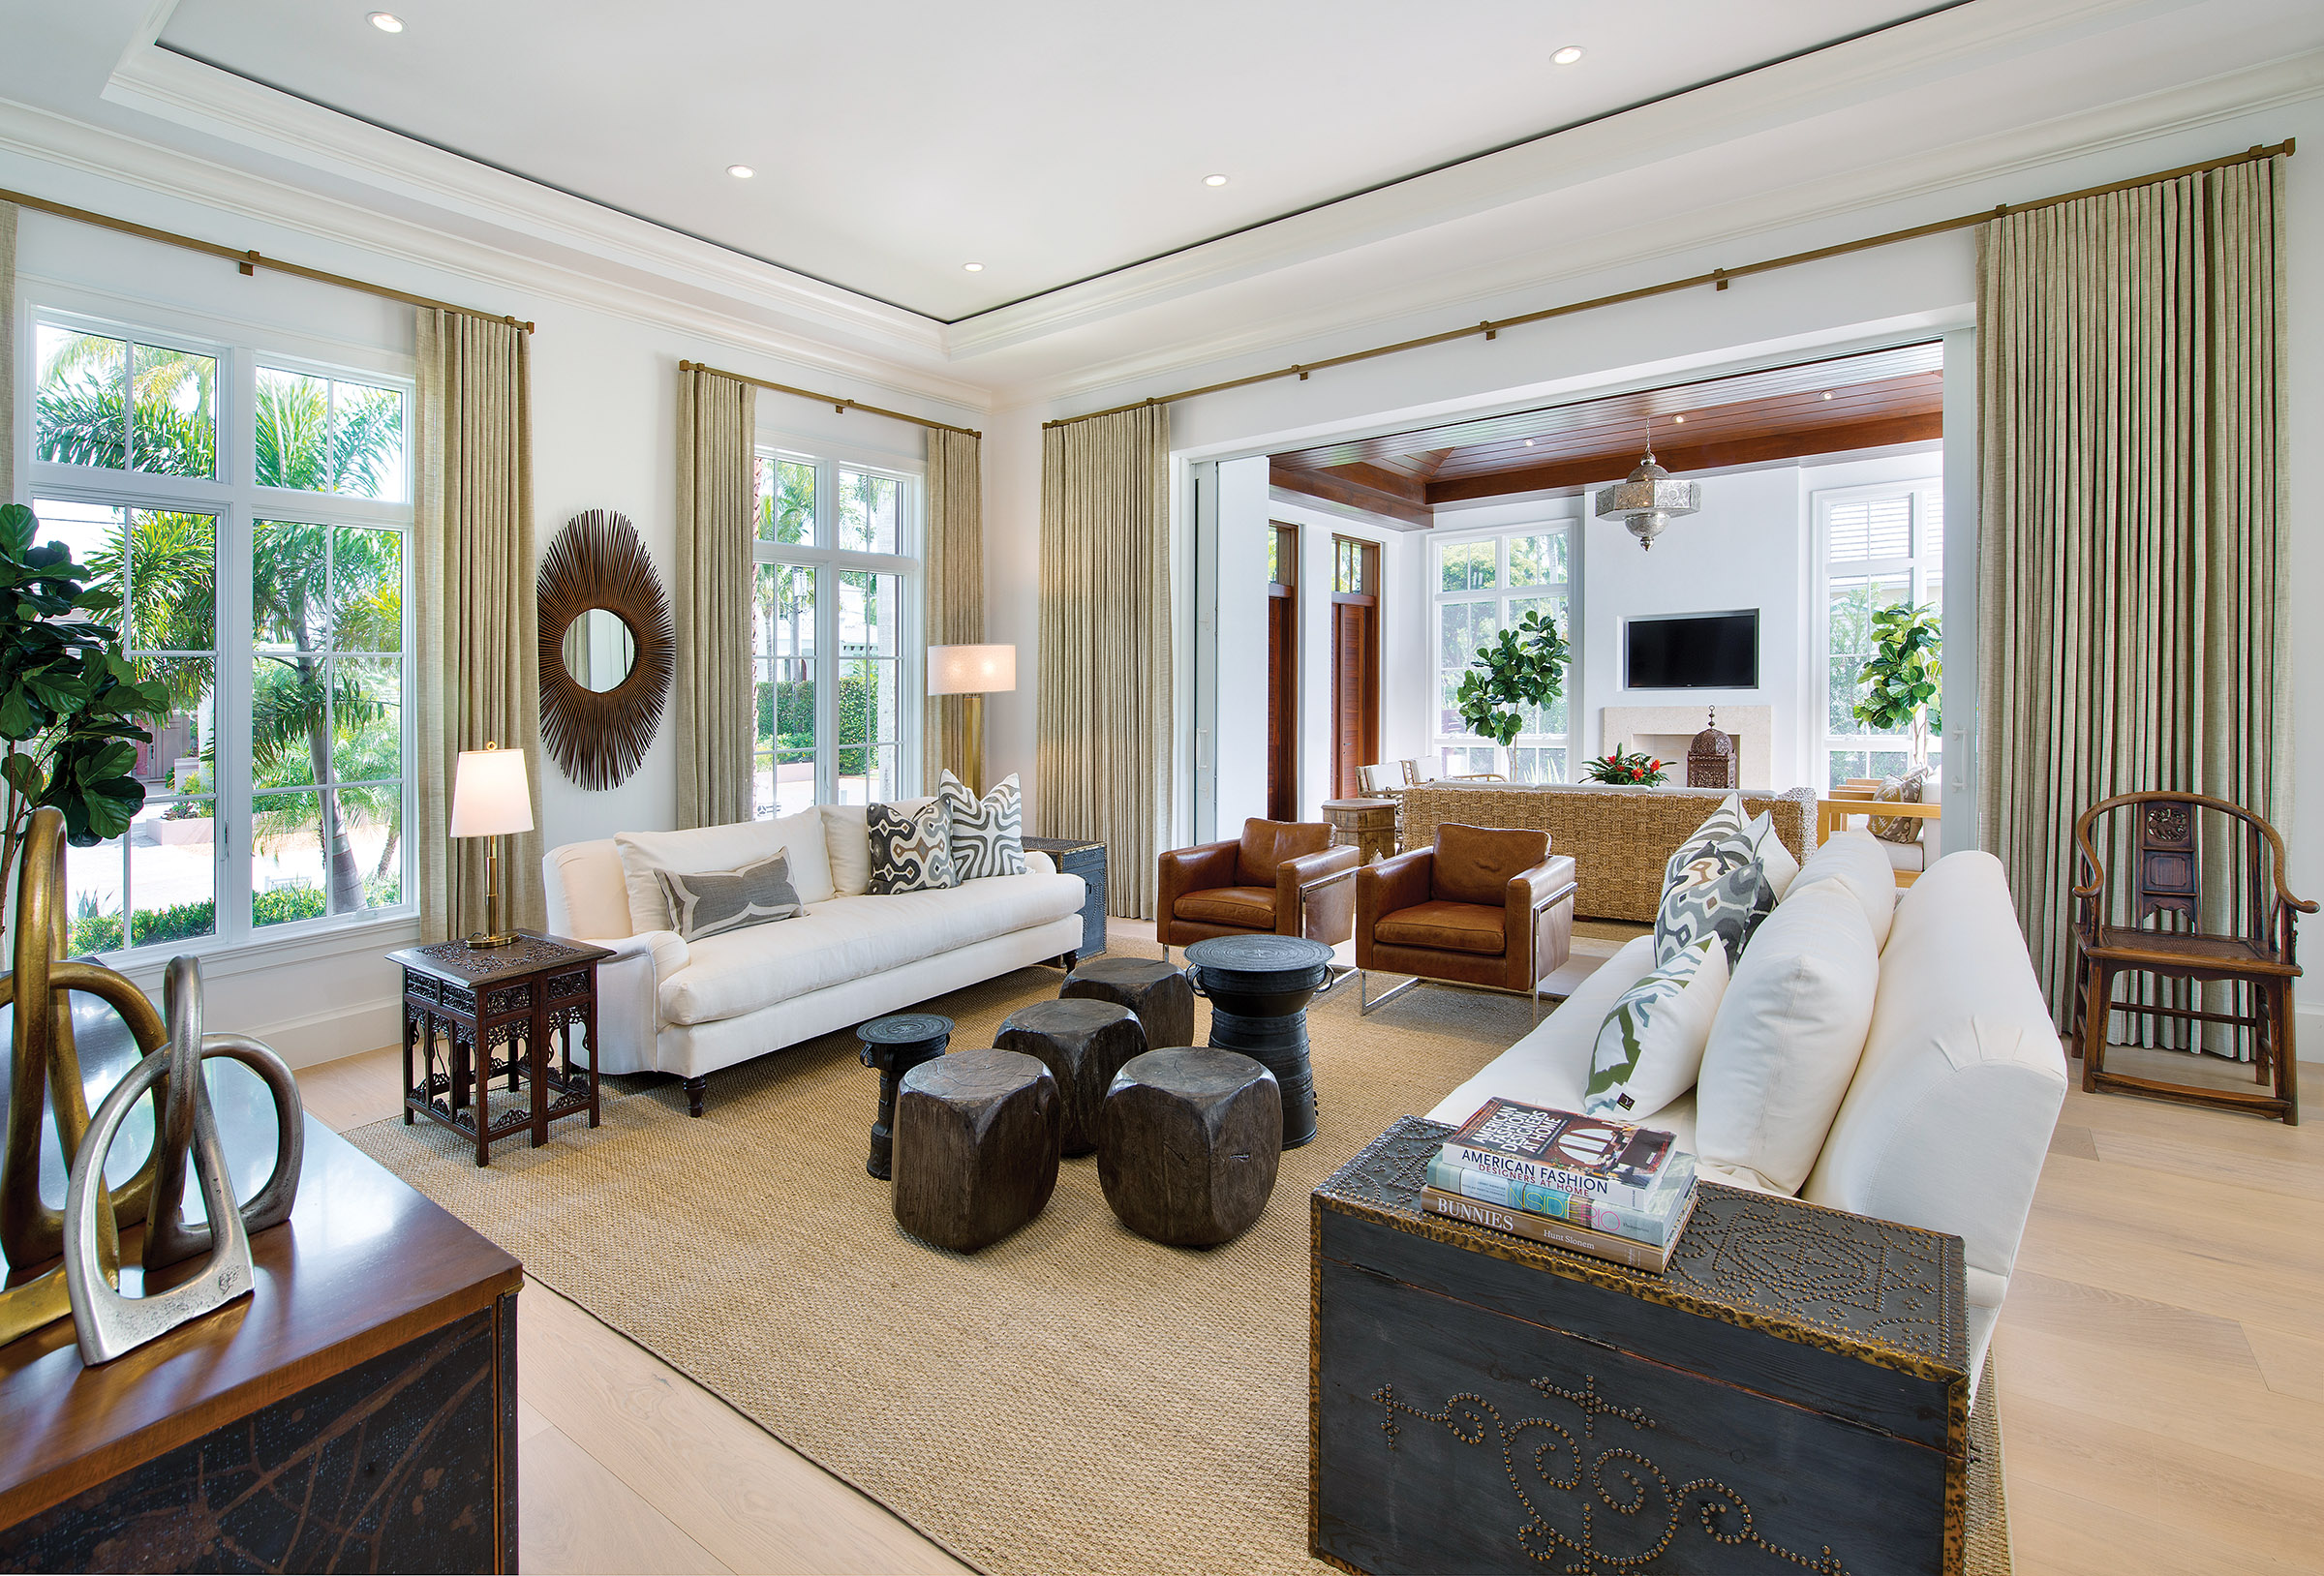 3. Jeffrey Fisher Living Room & Lanai Gio.jpg